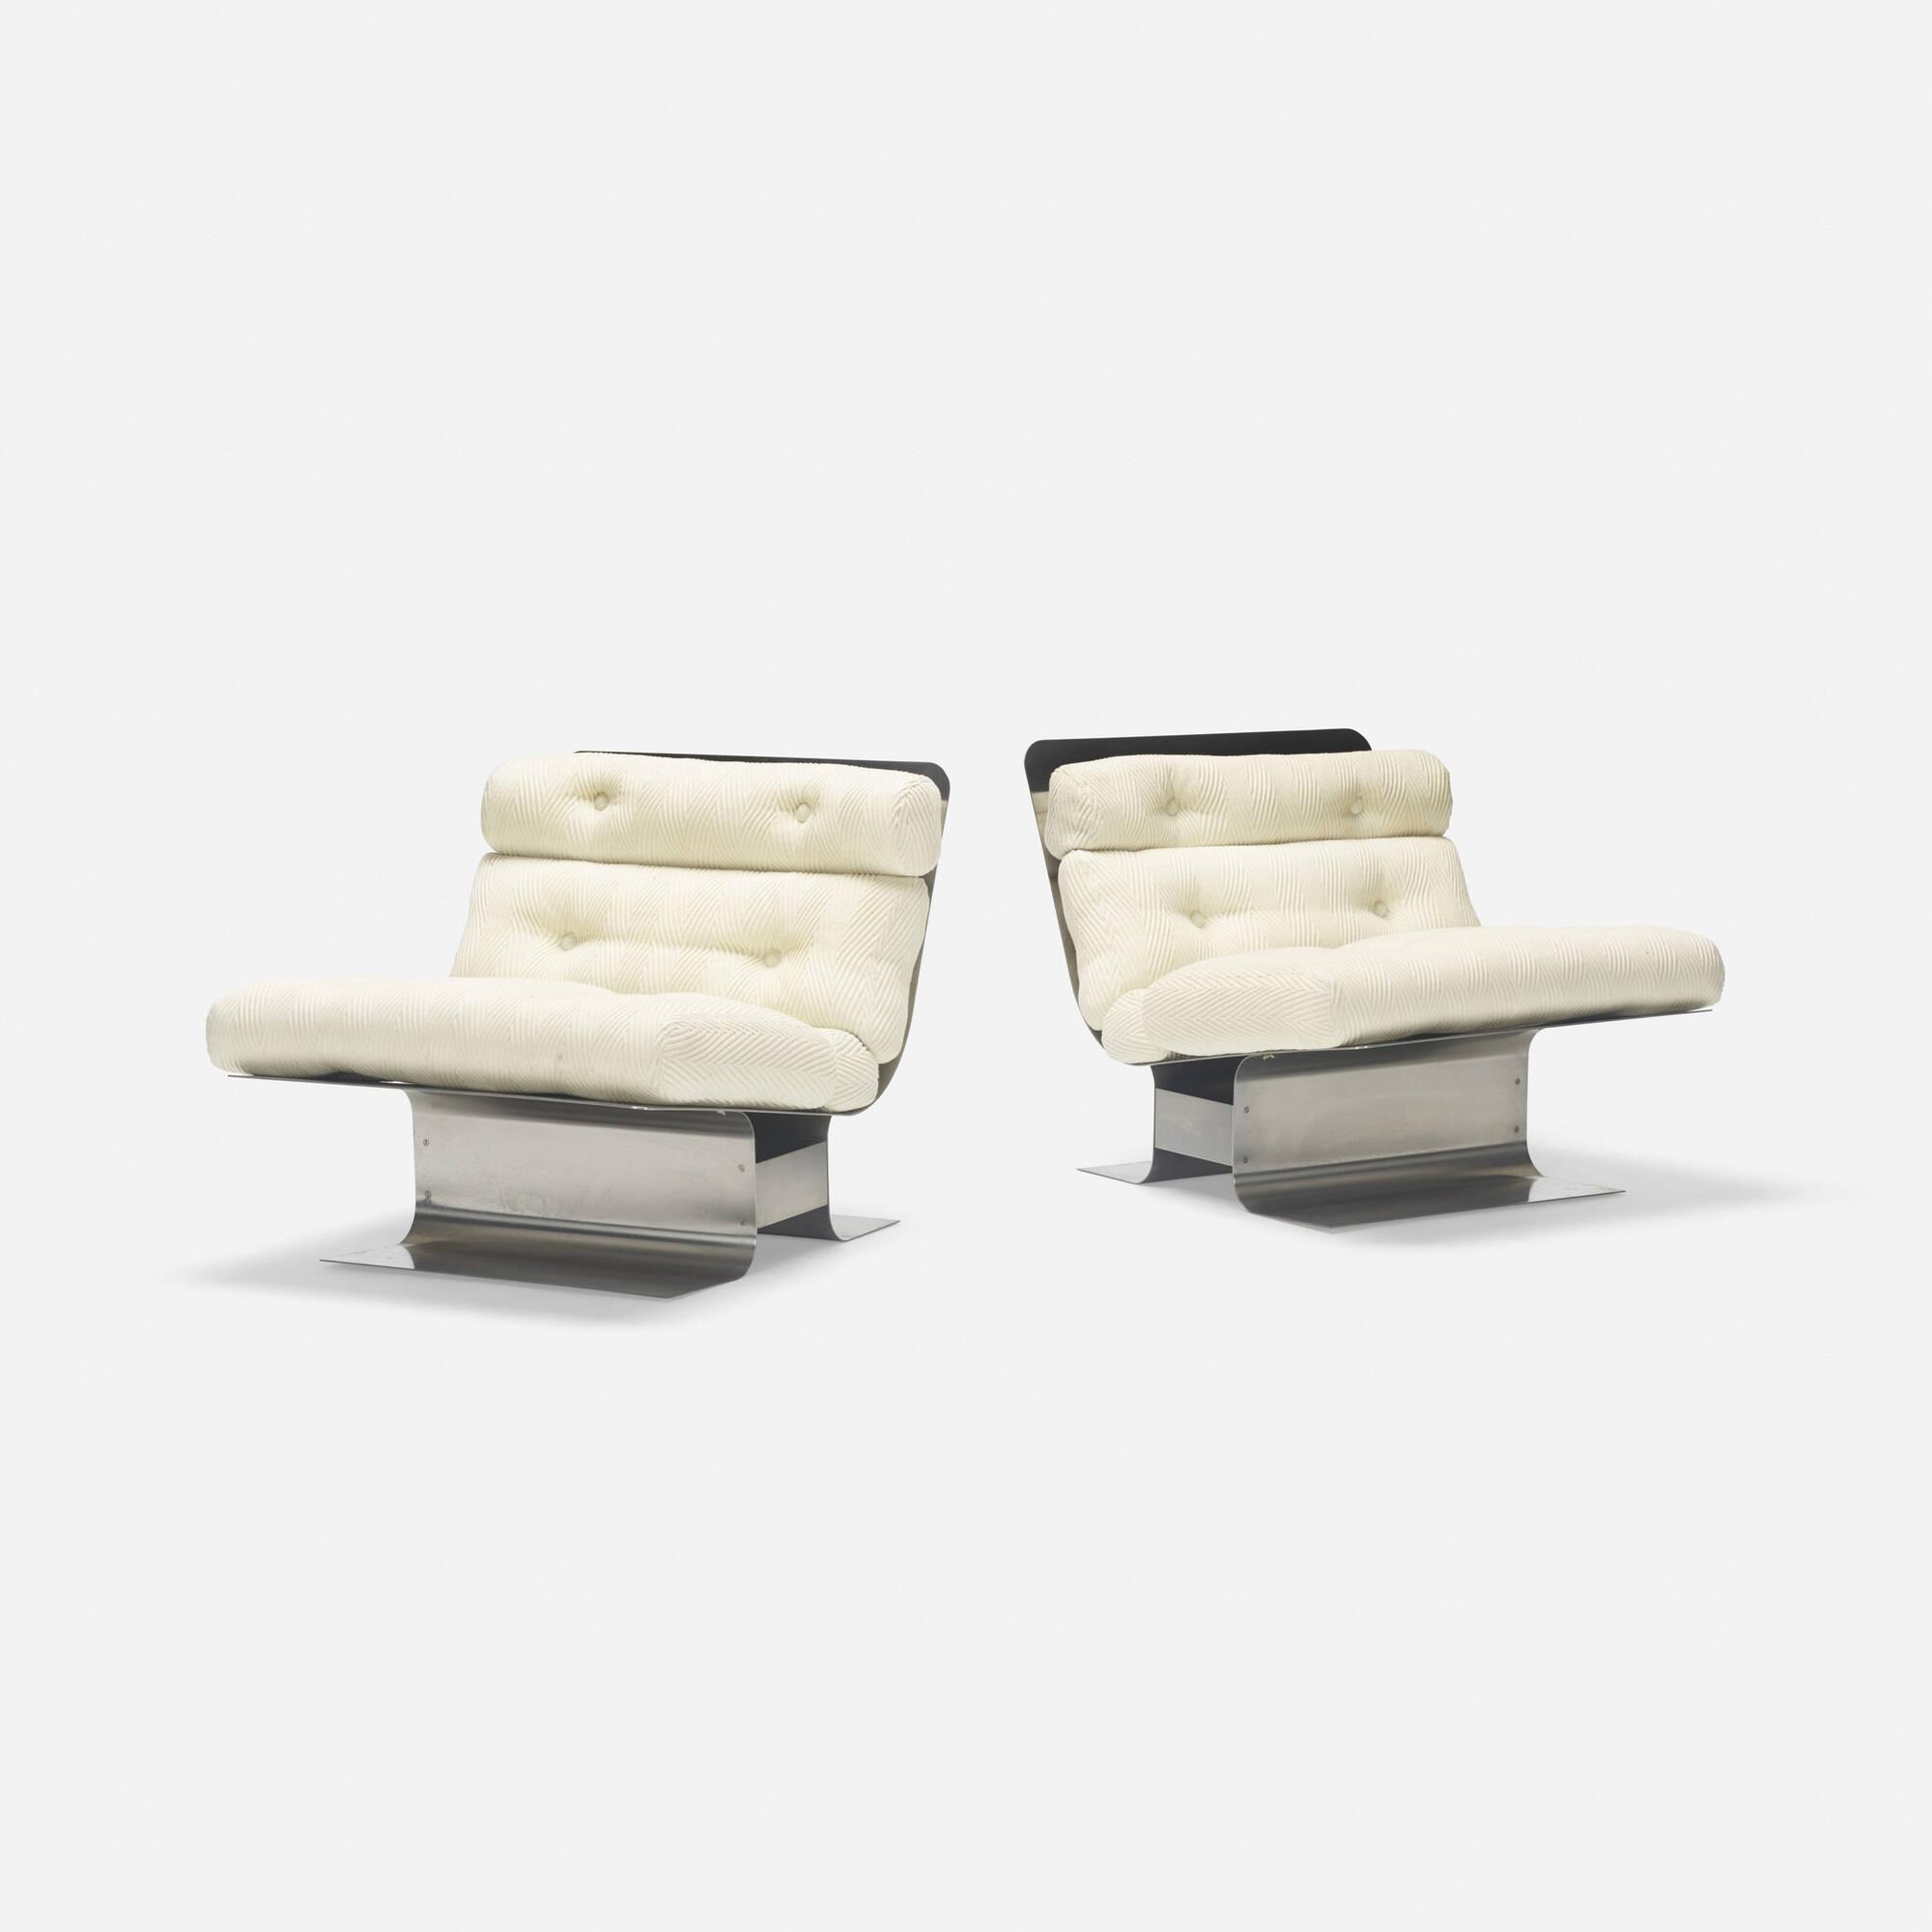 326: François Monnet / lounge chairs, pair (2 of 3)